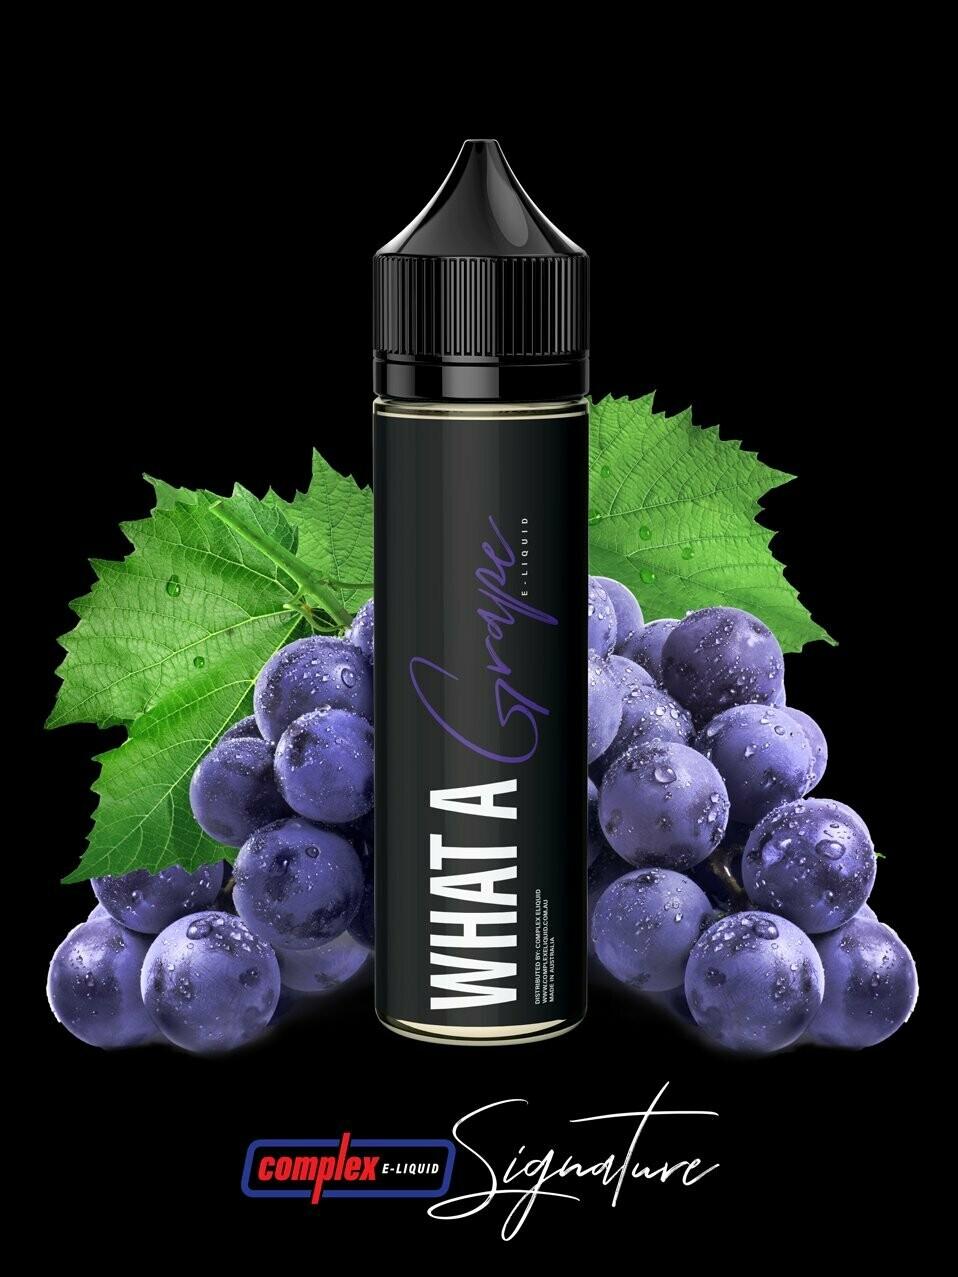 Signature - What A Grape